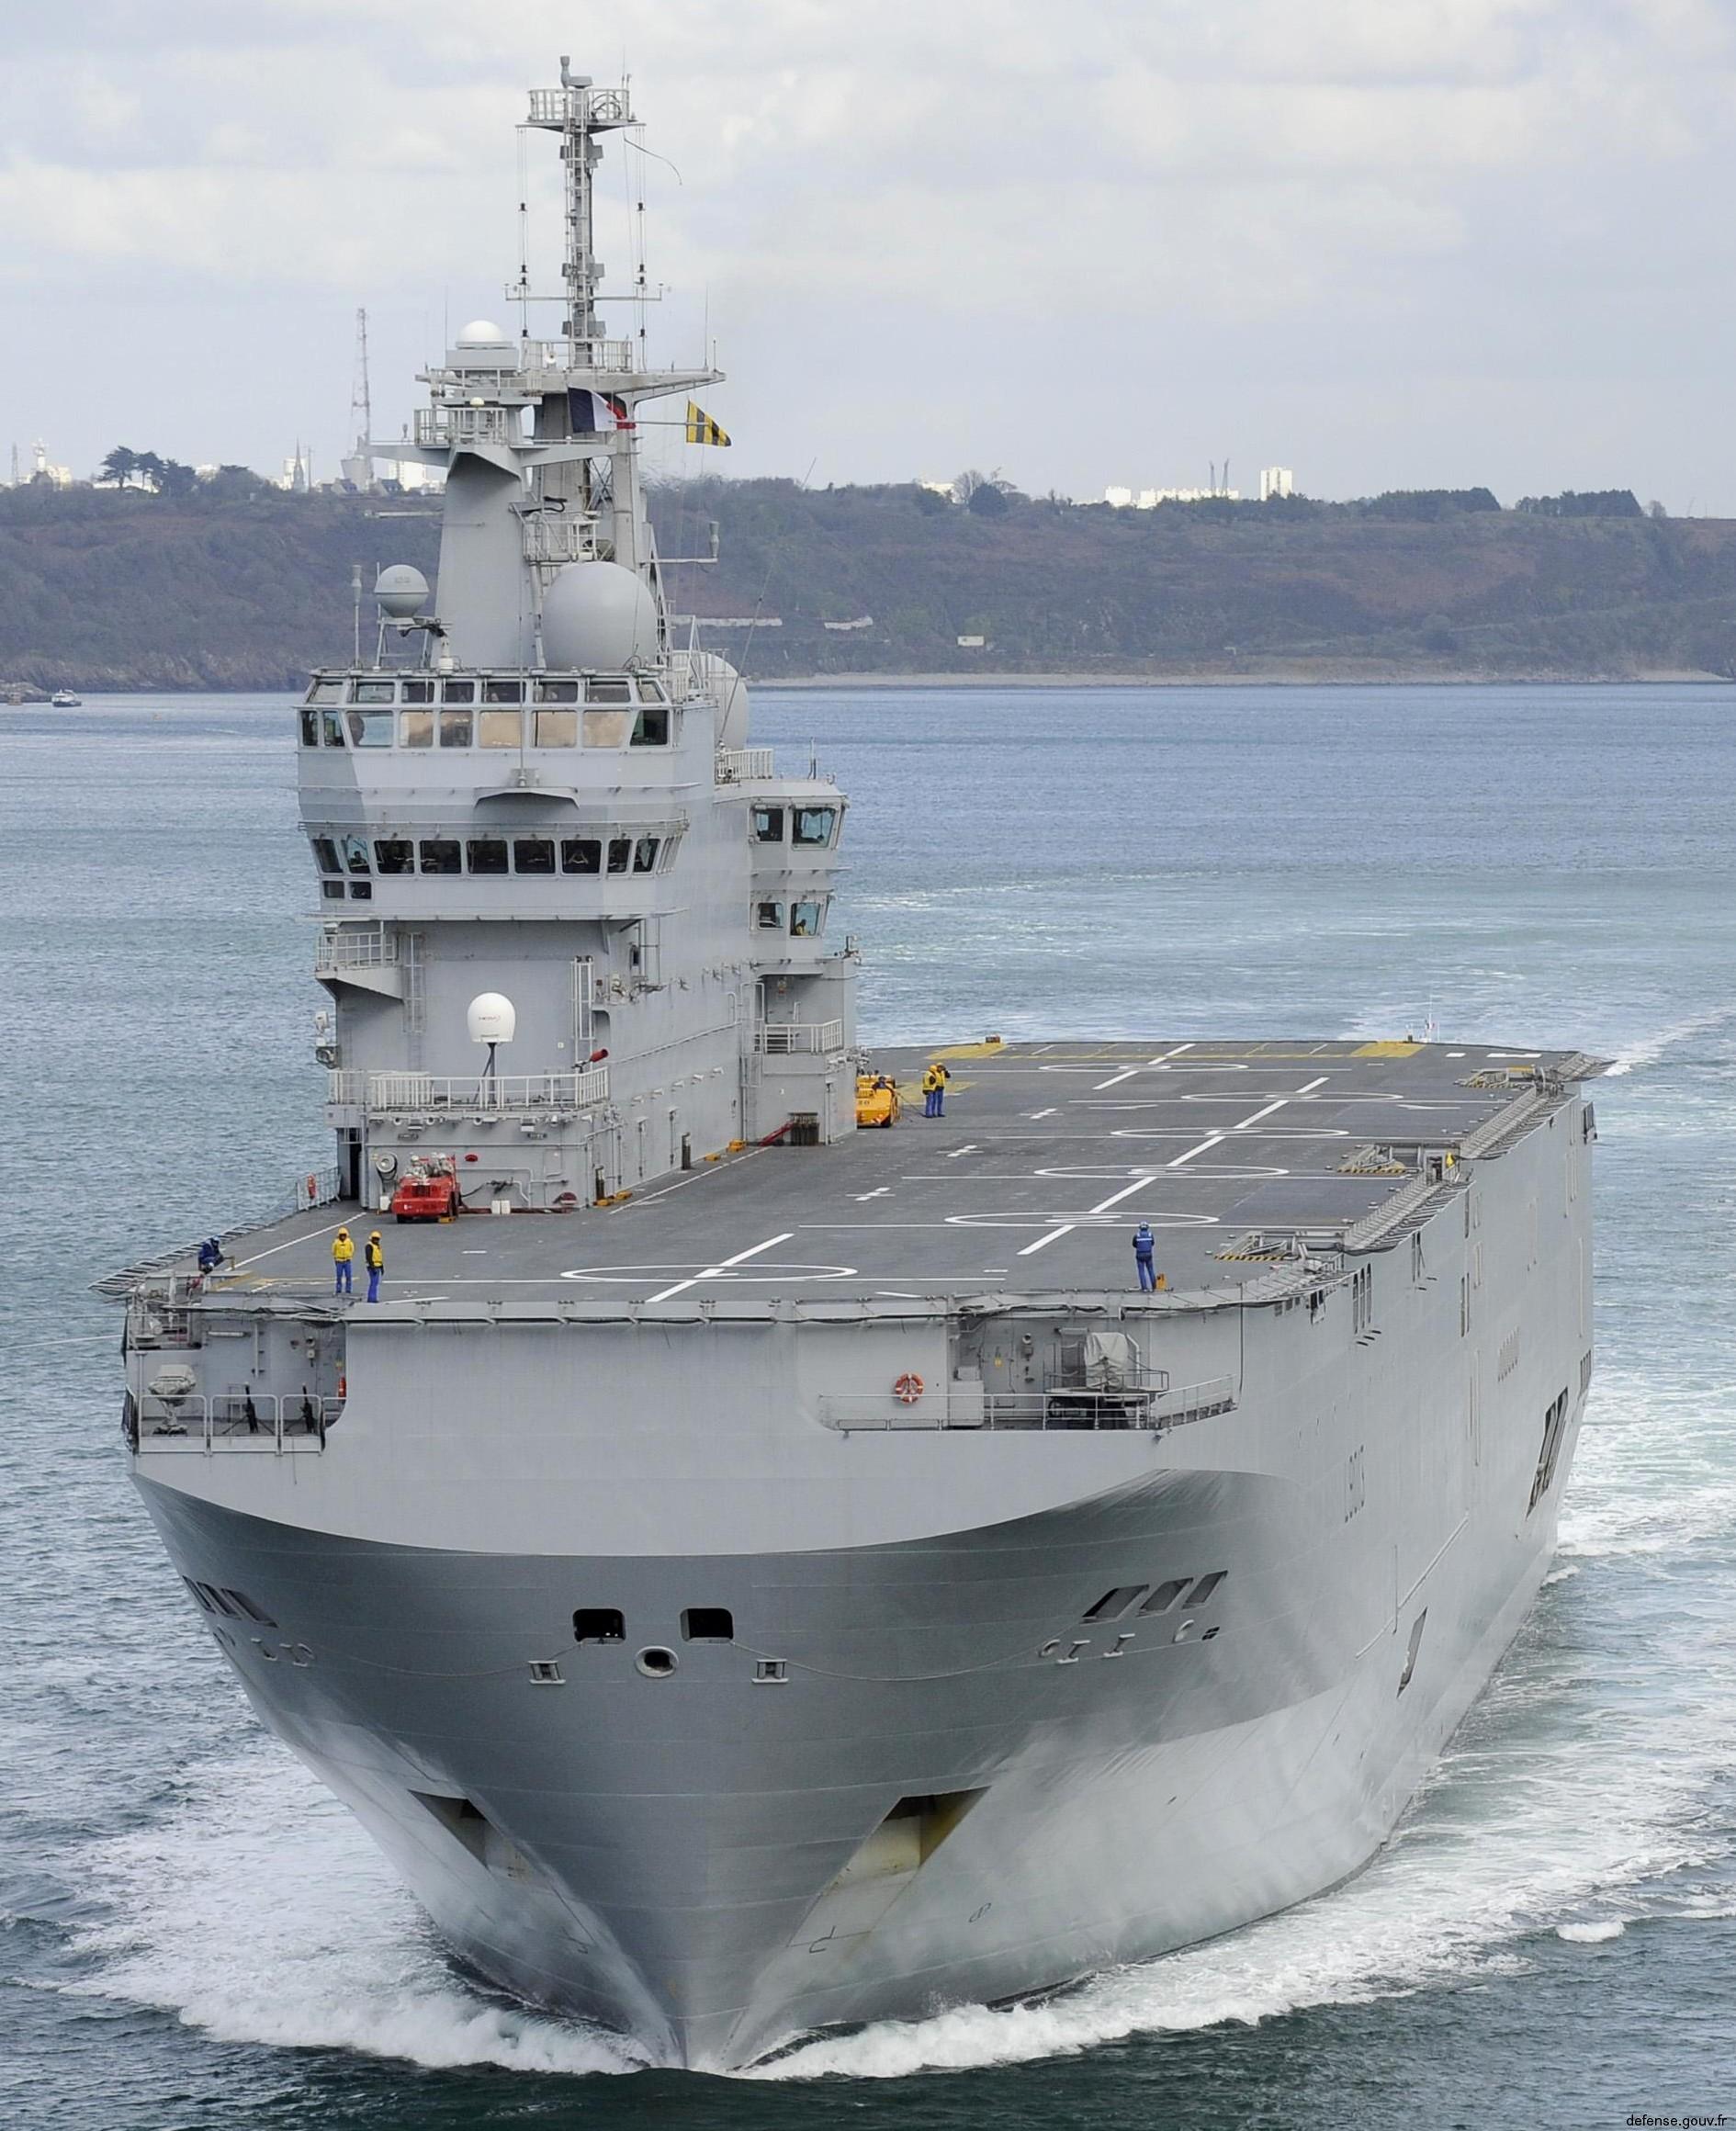 FS Mistral L 9013 Amphibious Asault Ship French Navy